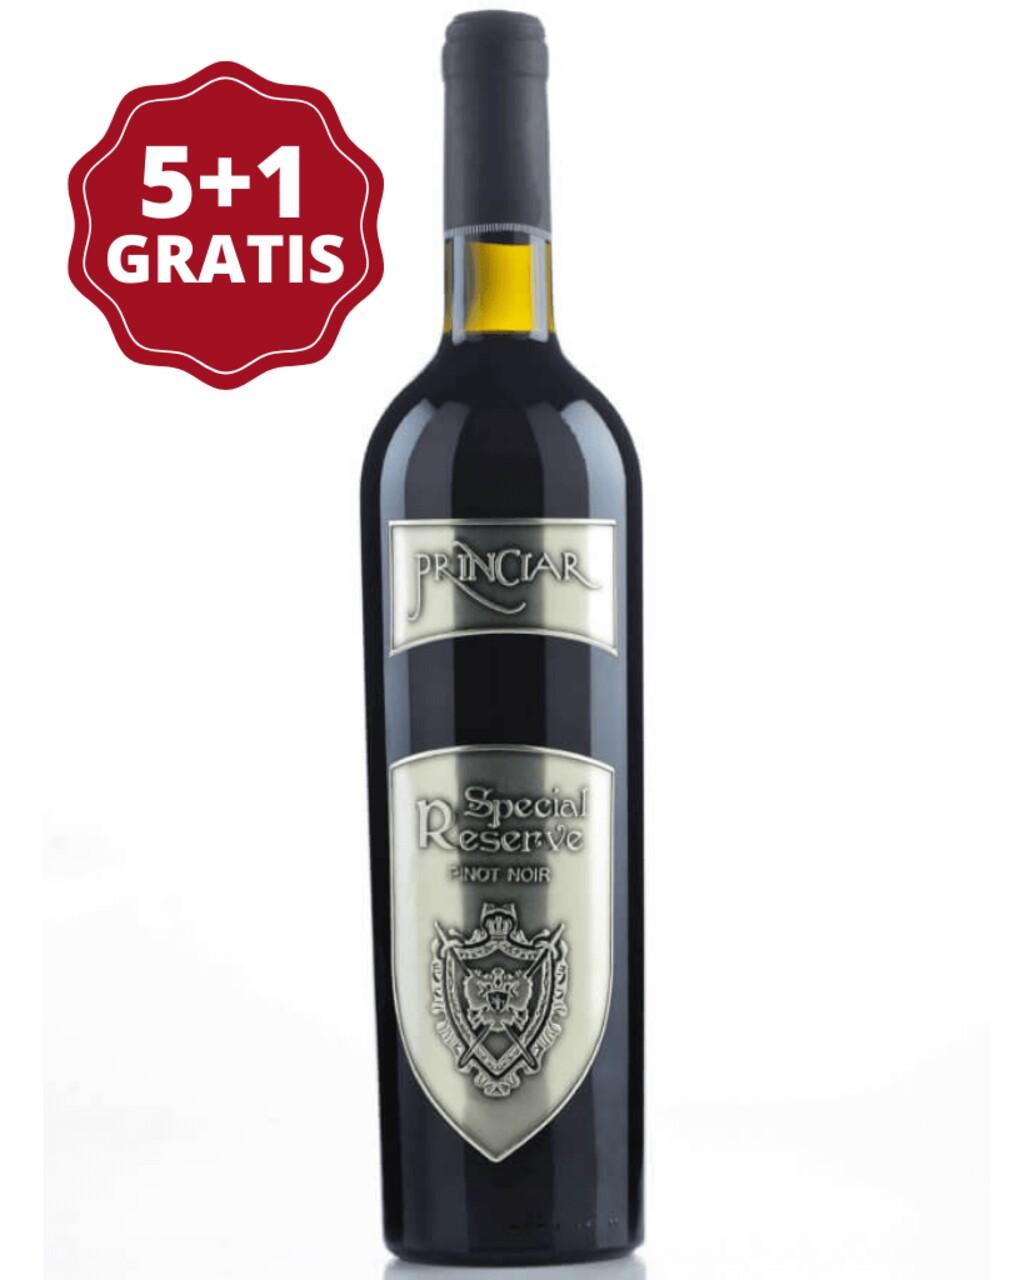 Tohani Princiar Special Reserve Pinot Noir 5+1